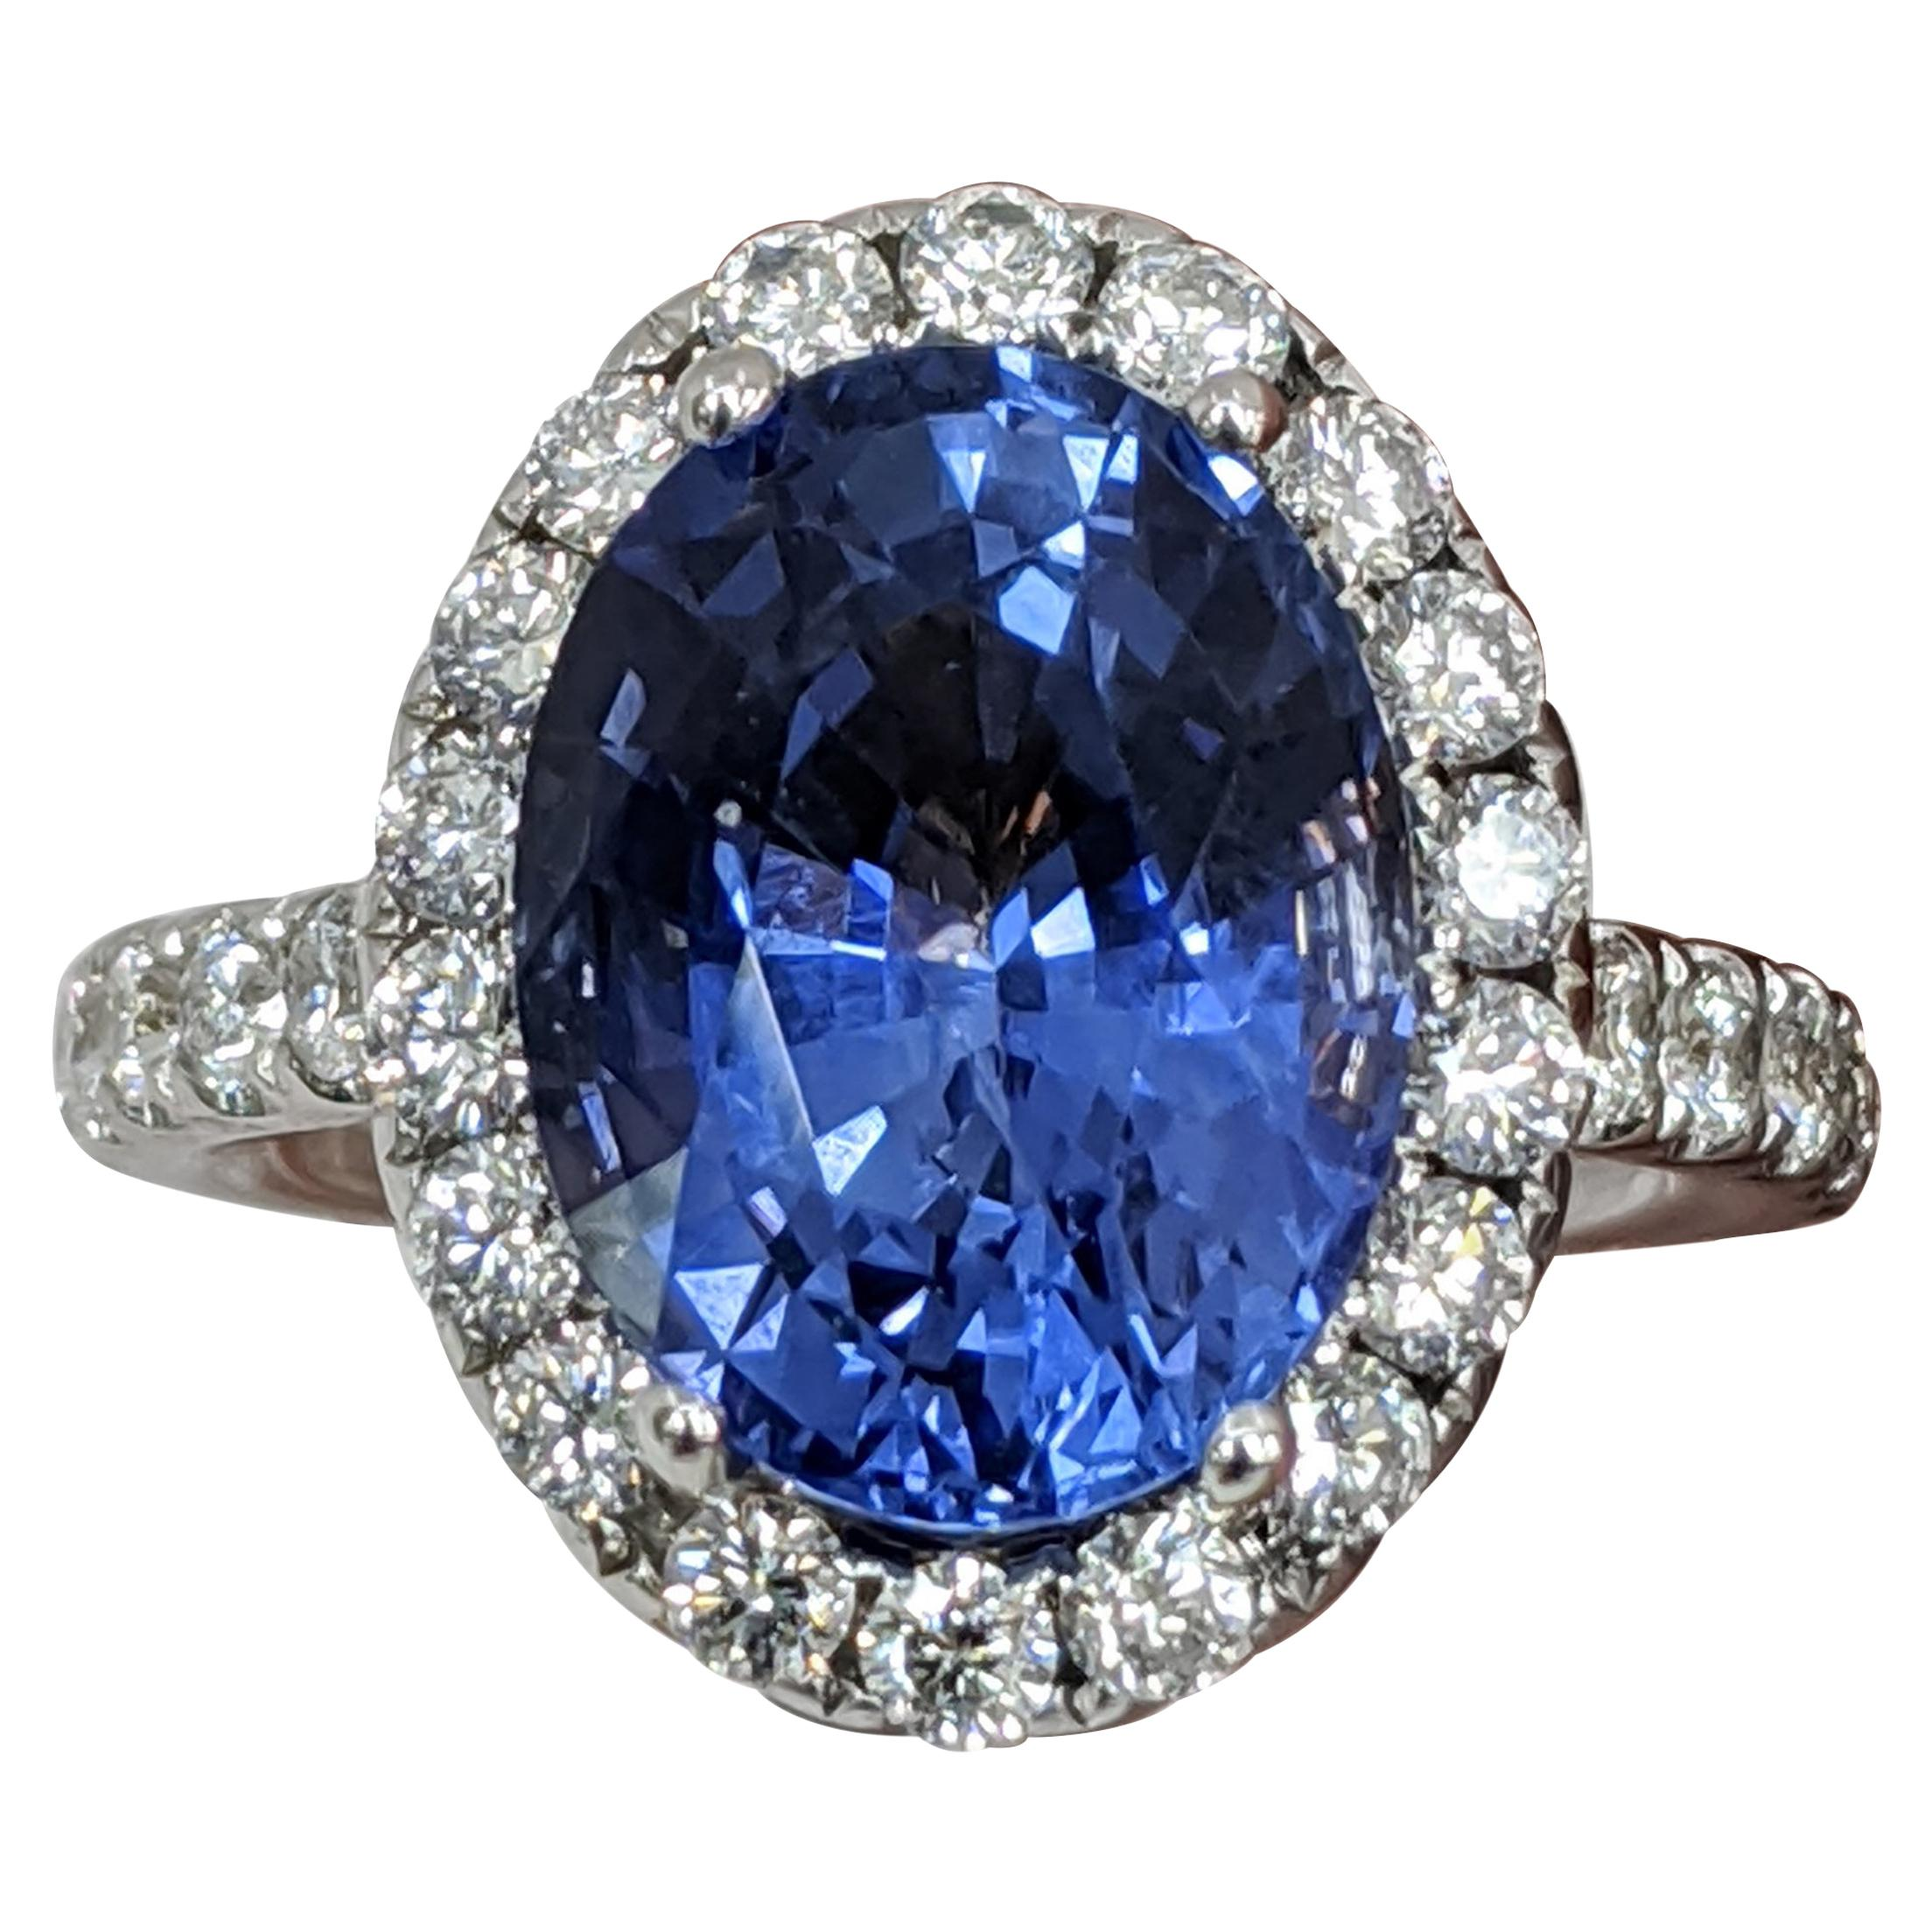 18 Karat White Gold Oval Cut Blue Sapphire and Diamond Ring